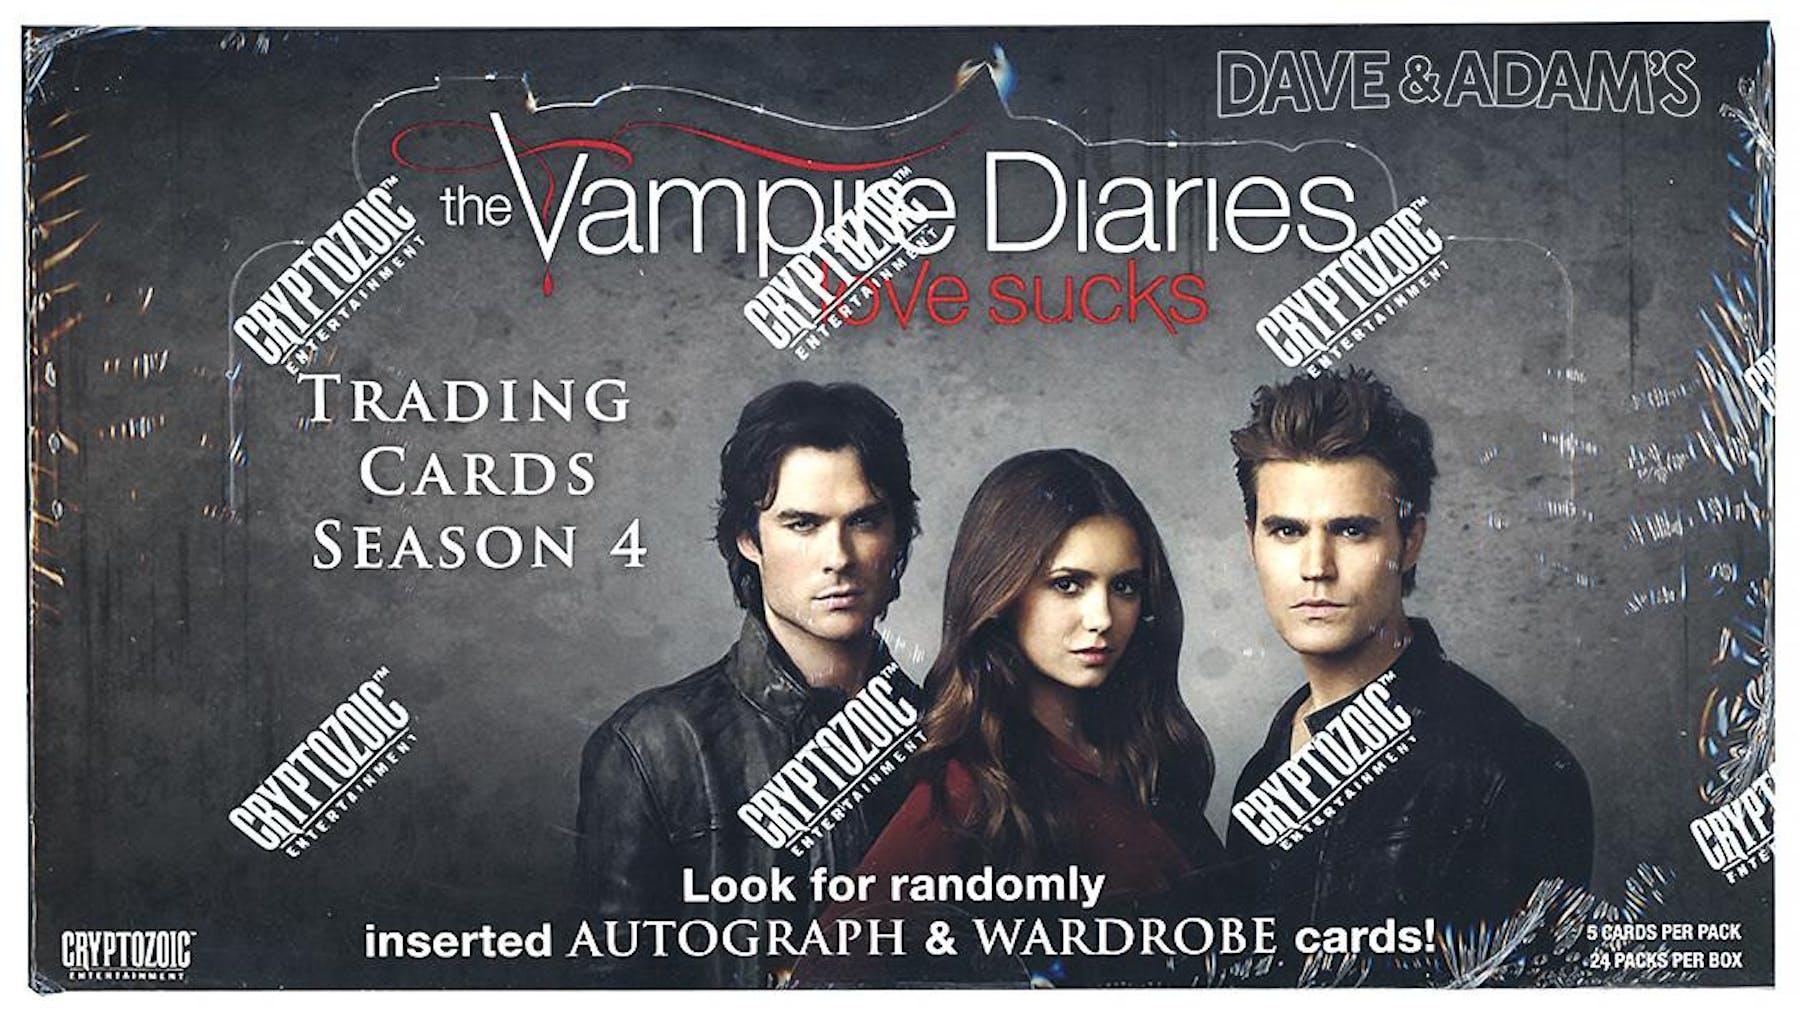 The Vampire Diaries Season 4 Trading Cards Box (Cryptozoic 2016